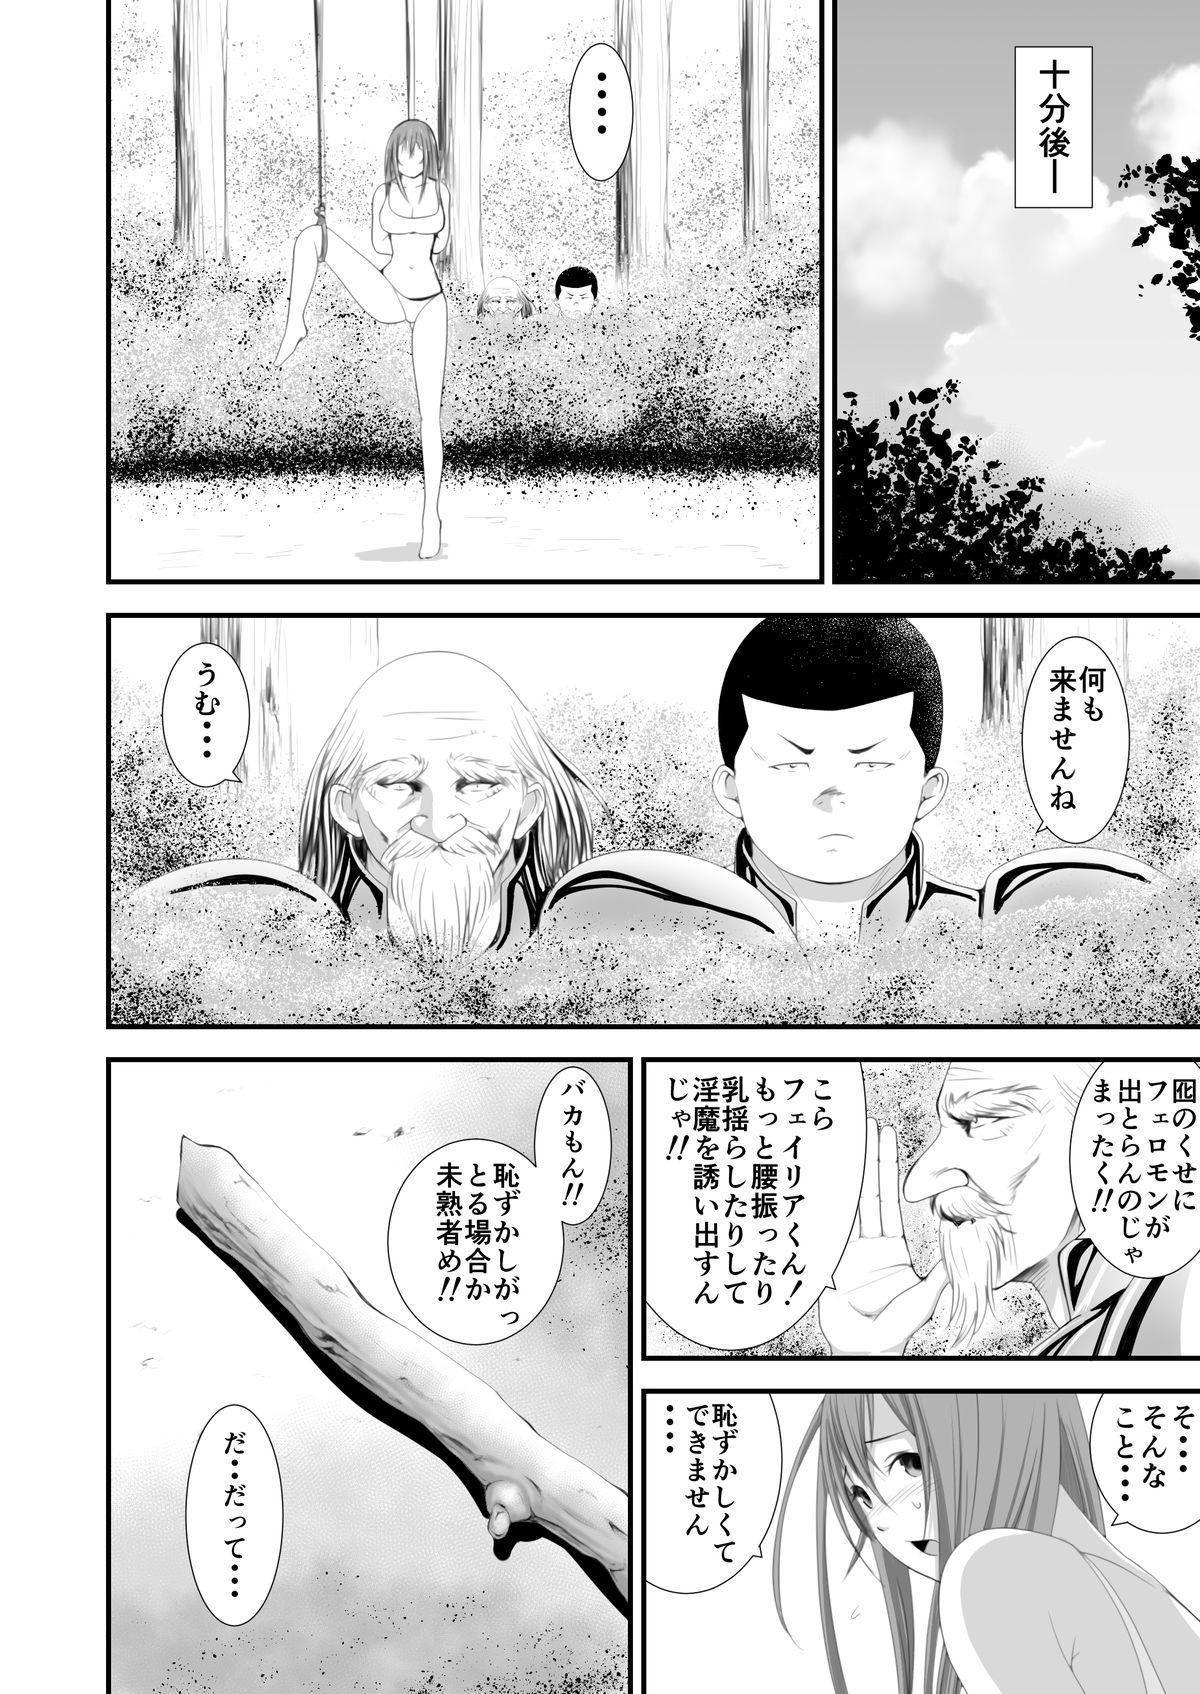 Inma Toubatsu Daisakusen Episode 3 7